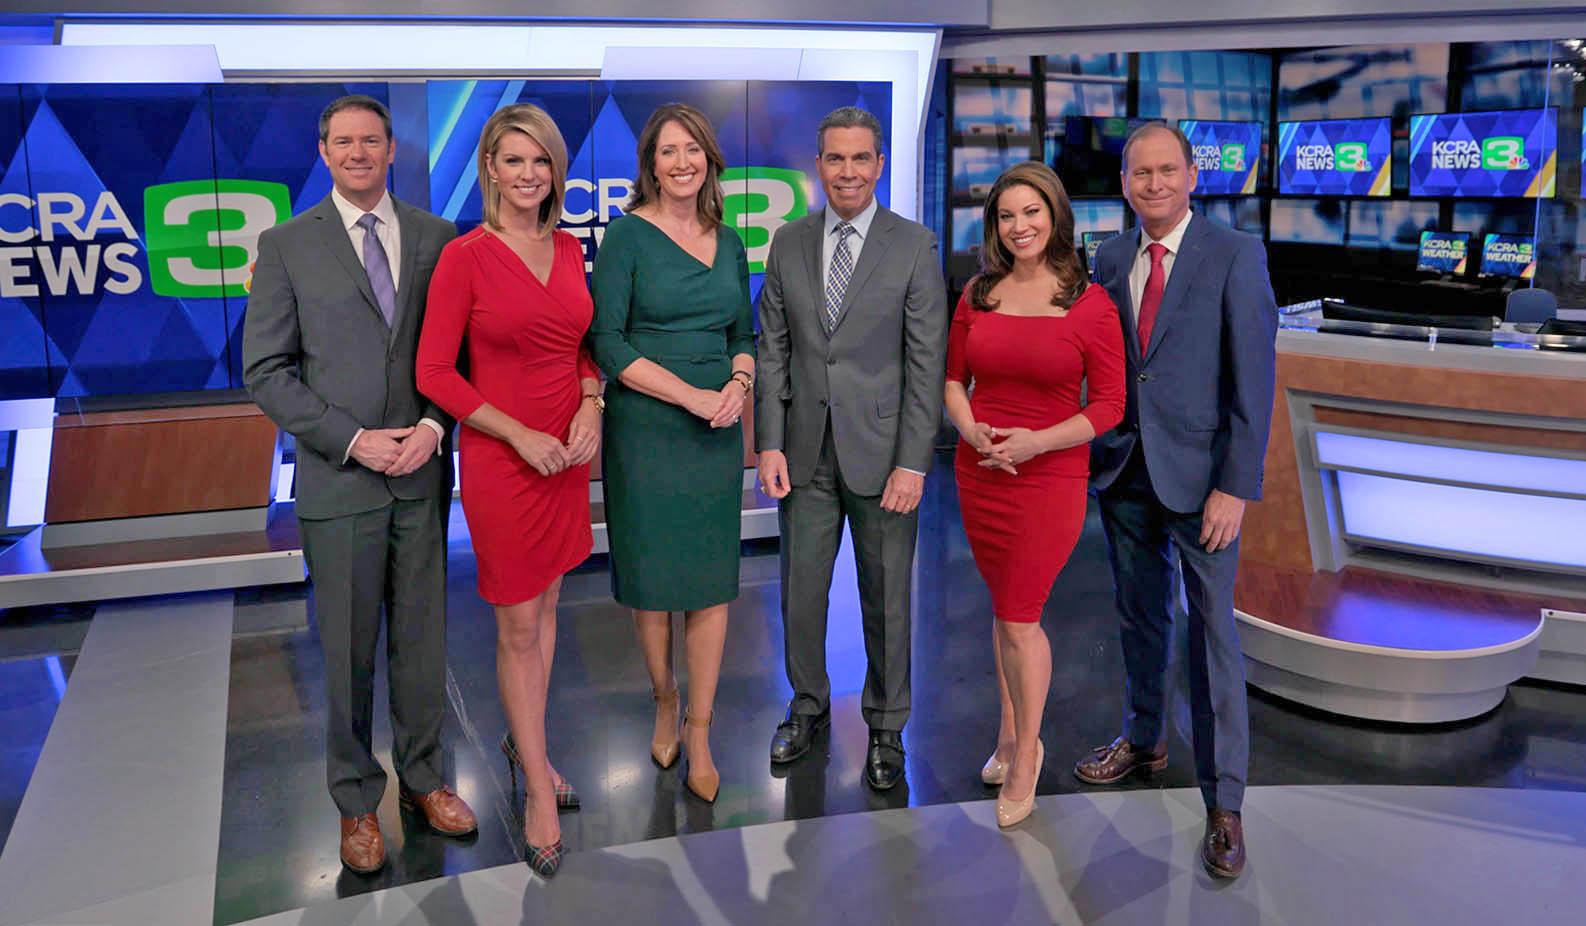 KCRA 3 News newscasters